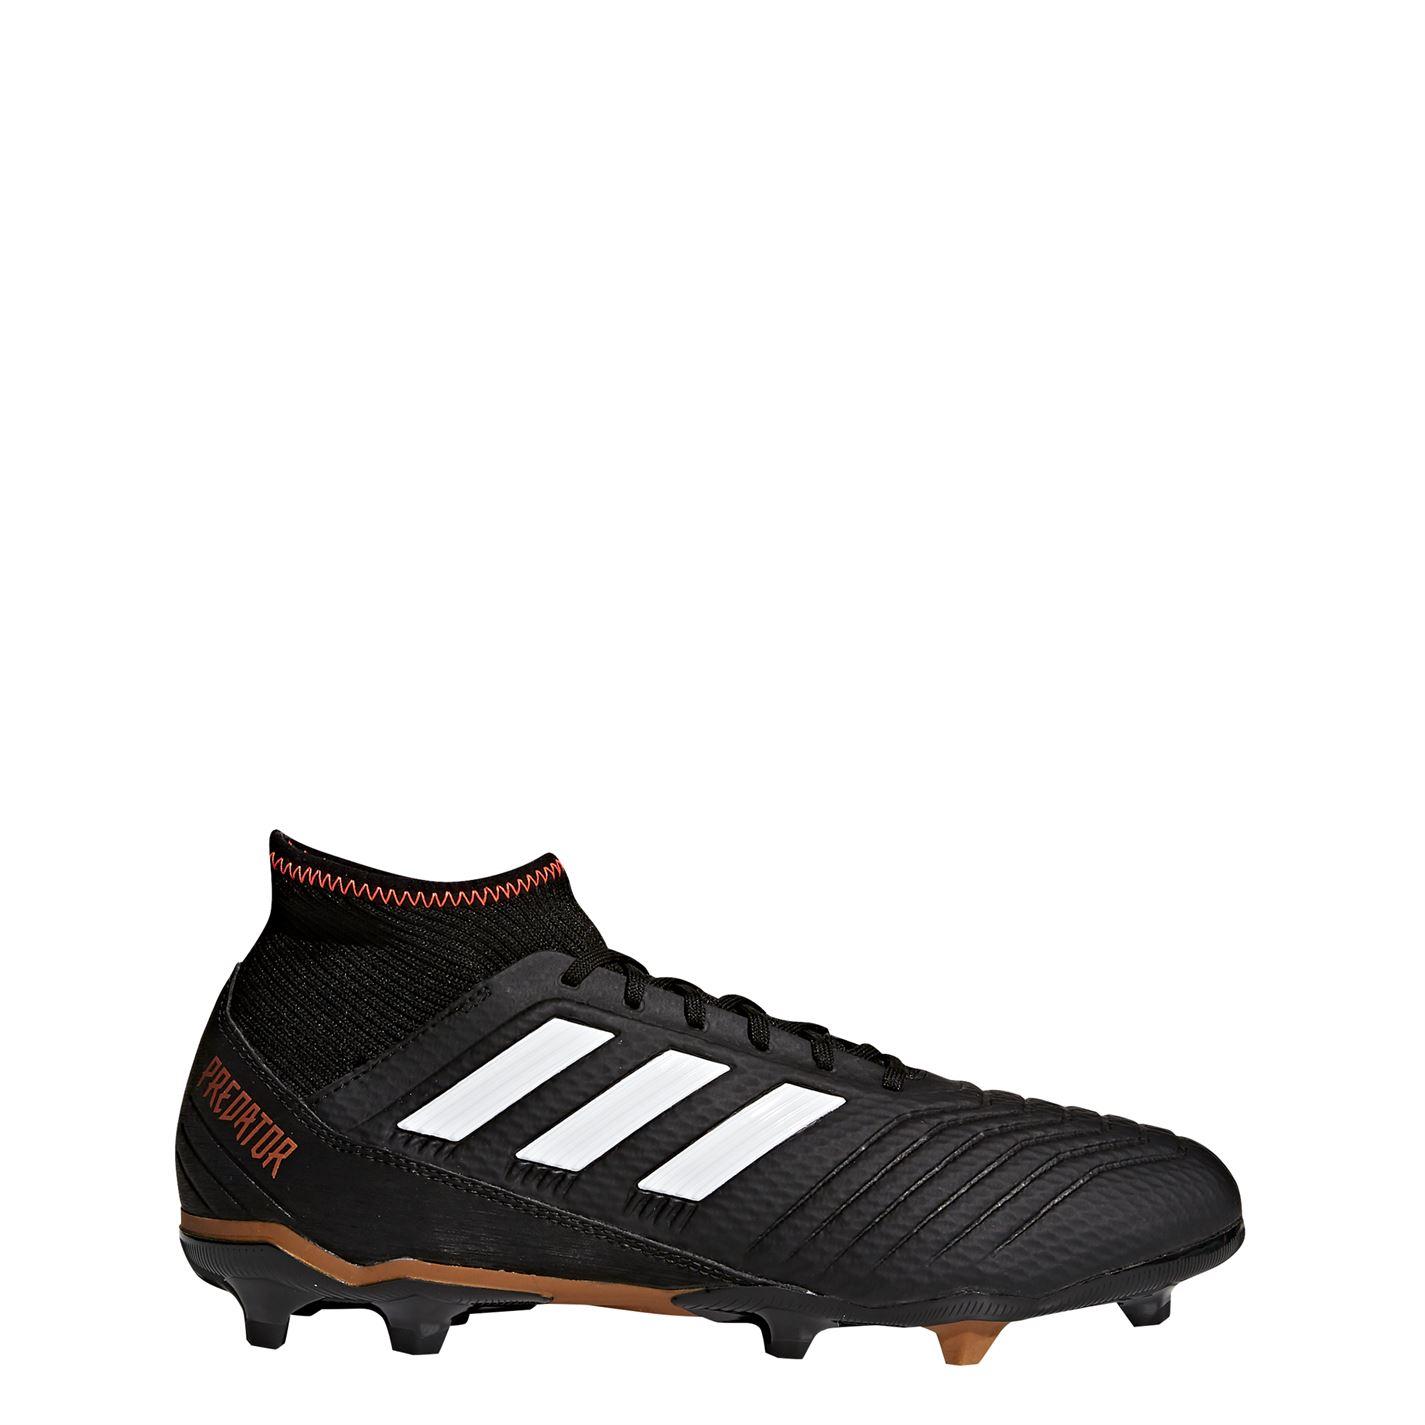 Adidas Predator 18.3 FG Mens Boots